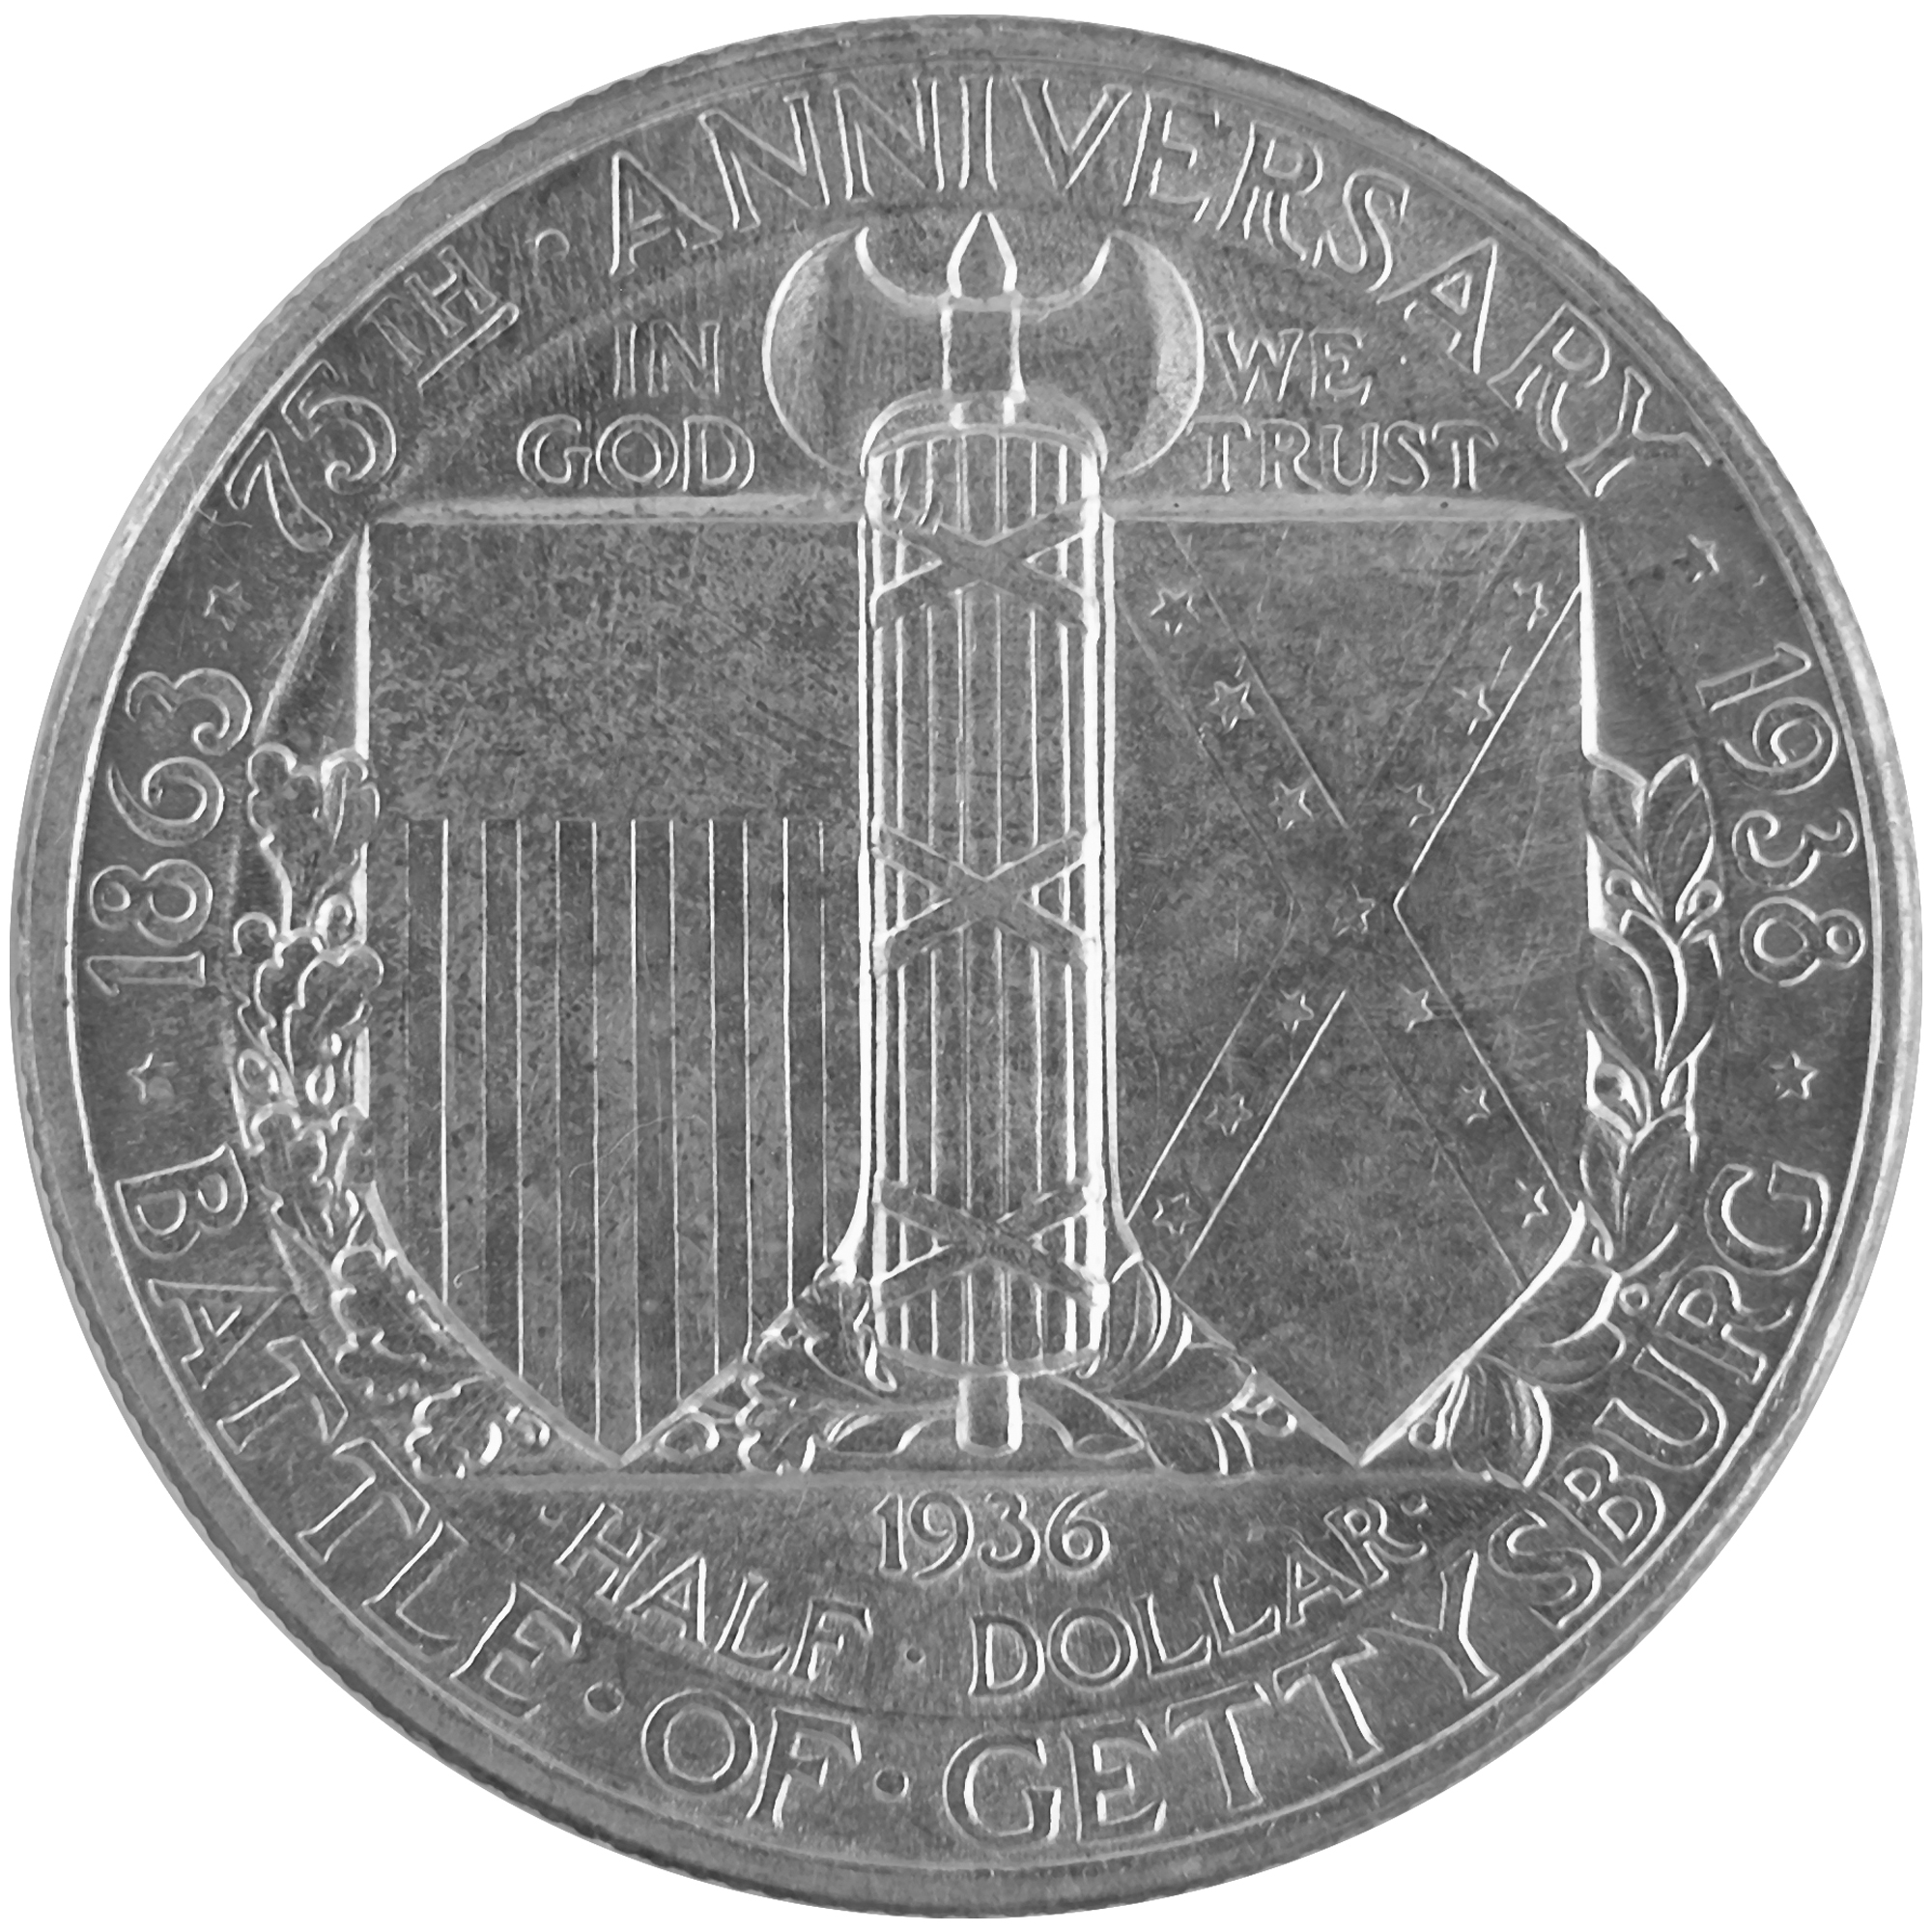 1936 Battle Of Gettysburg Commemorative Silver Half Dollar Coin Reverse